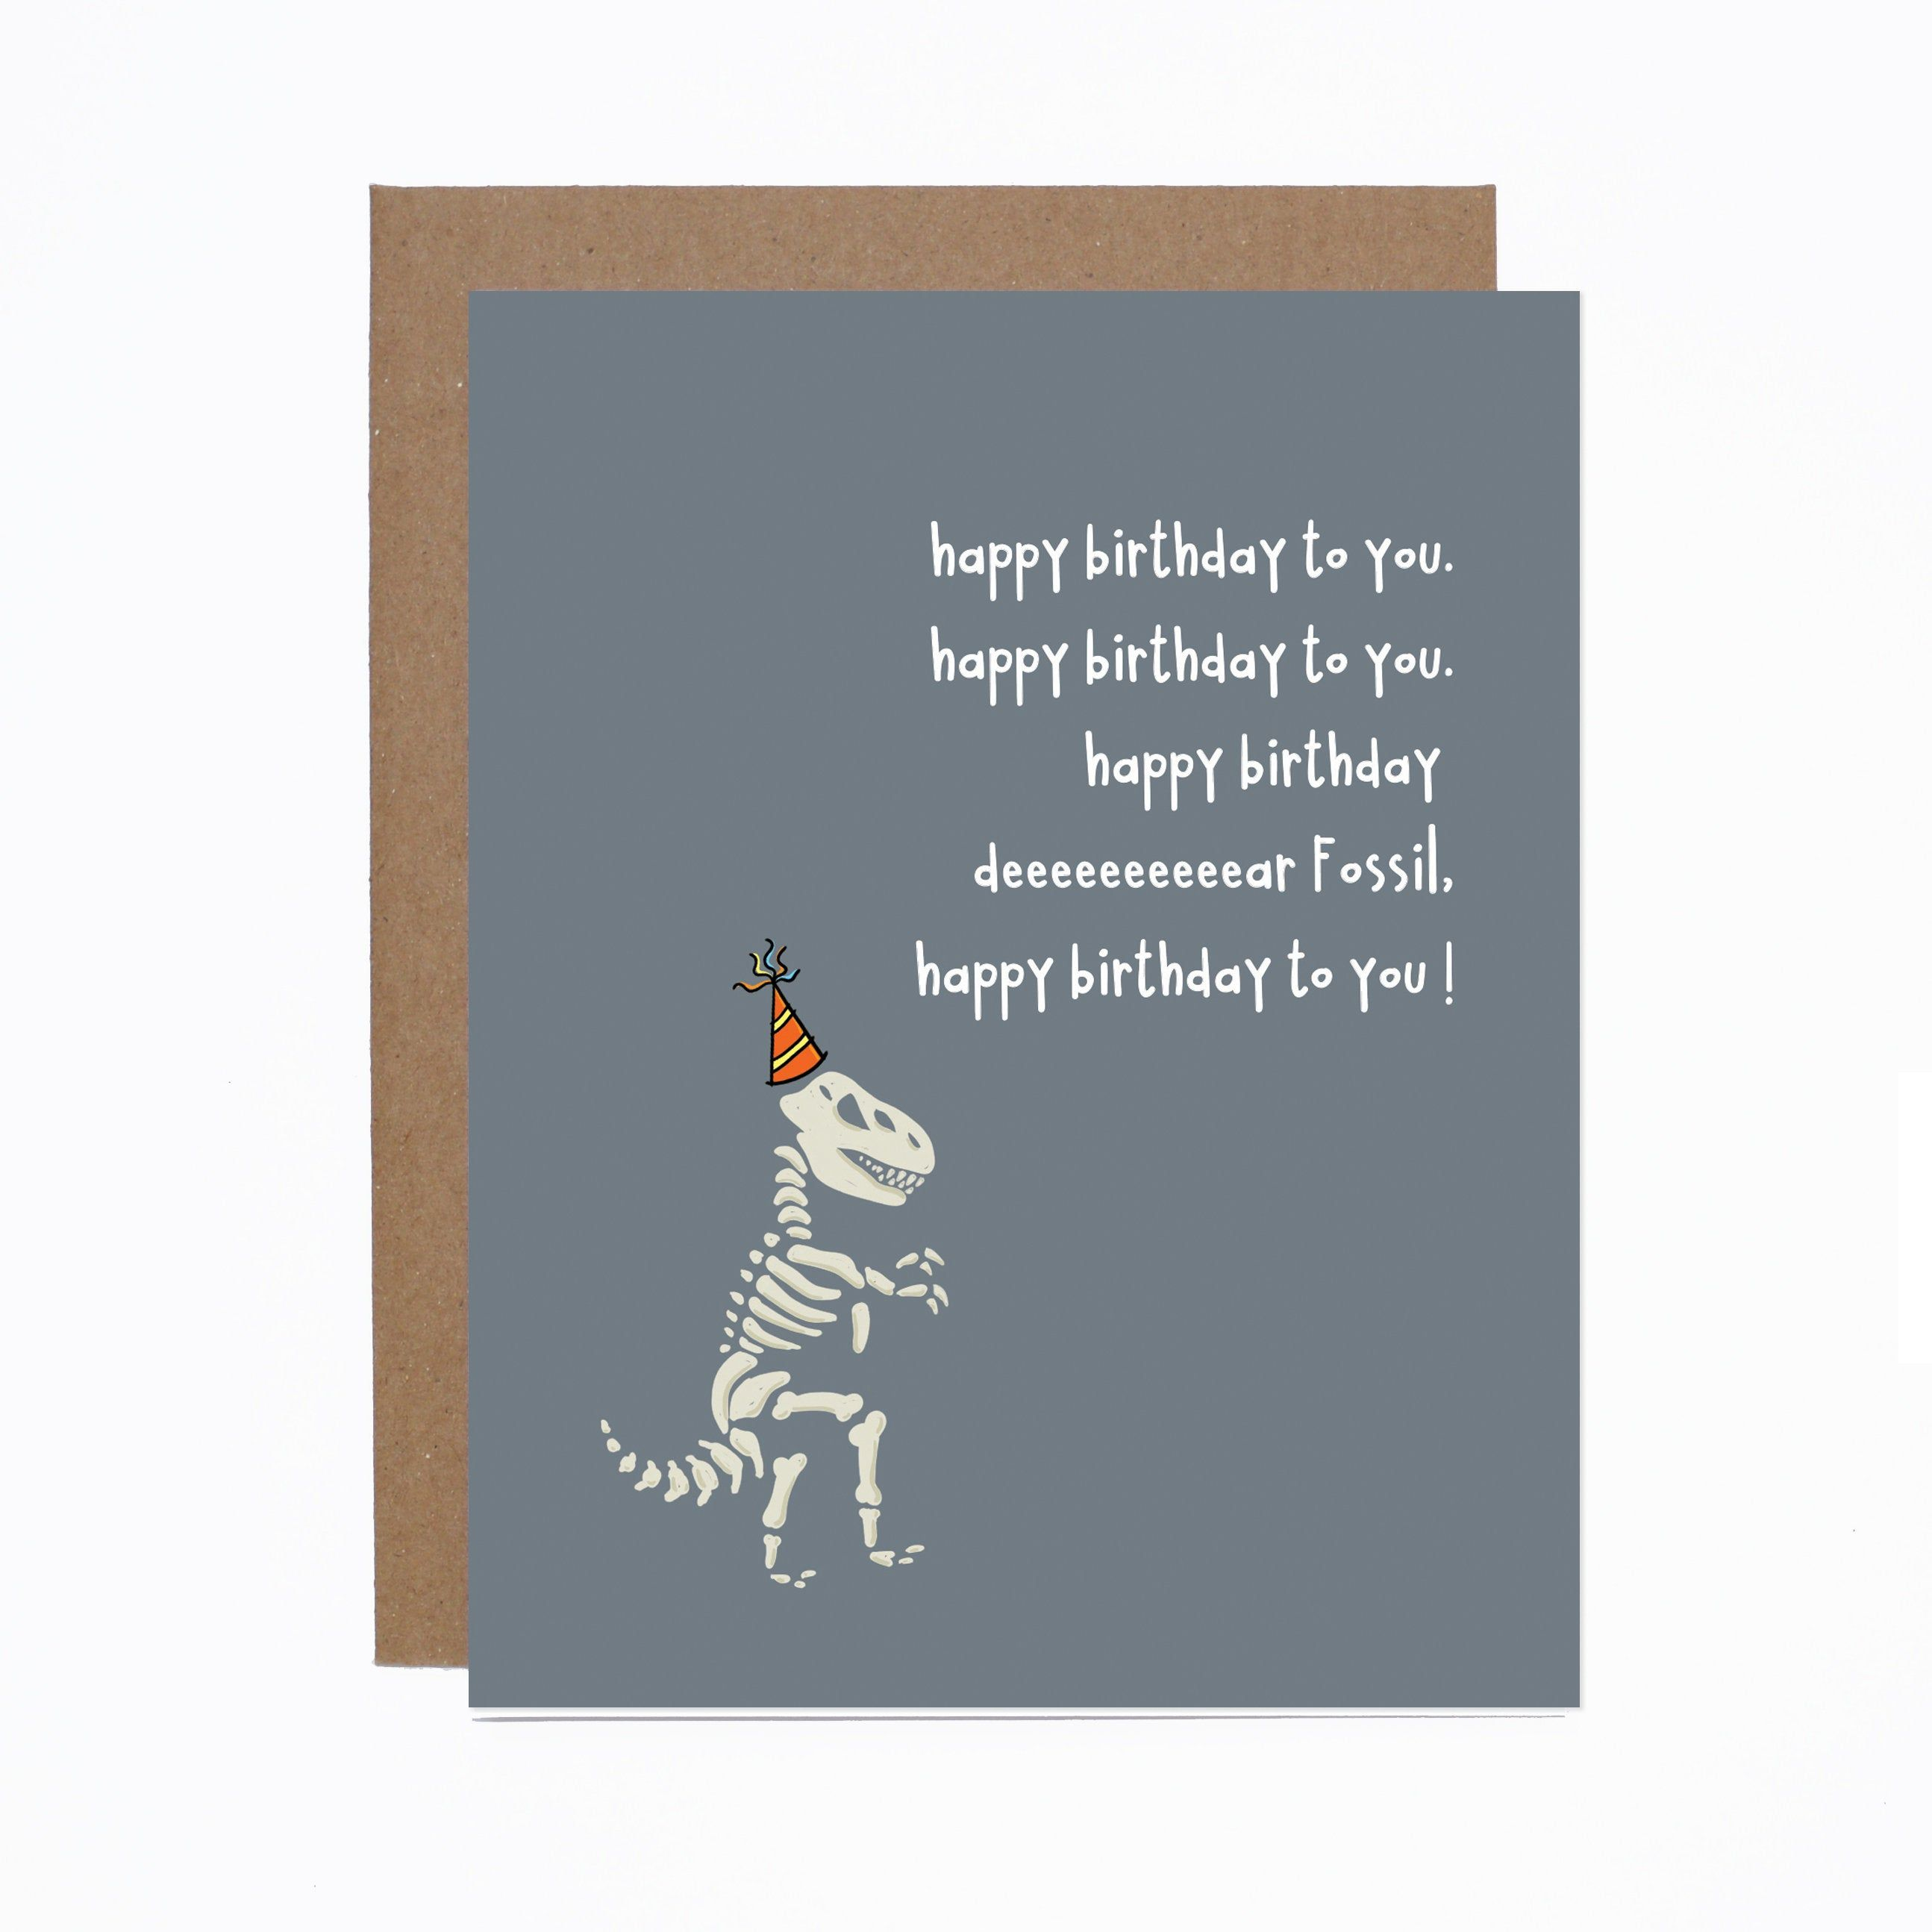 Happy Birthday Fossil Card Funny Birthday Card Dinosaur Birthday Getting Old Birthday Card Old Birthday Cards Funny Birthday Cards Birthday Humor